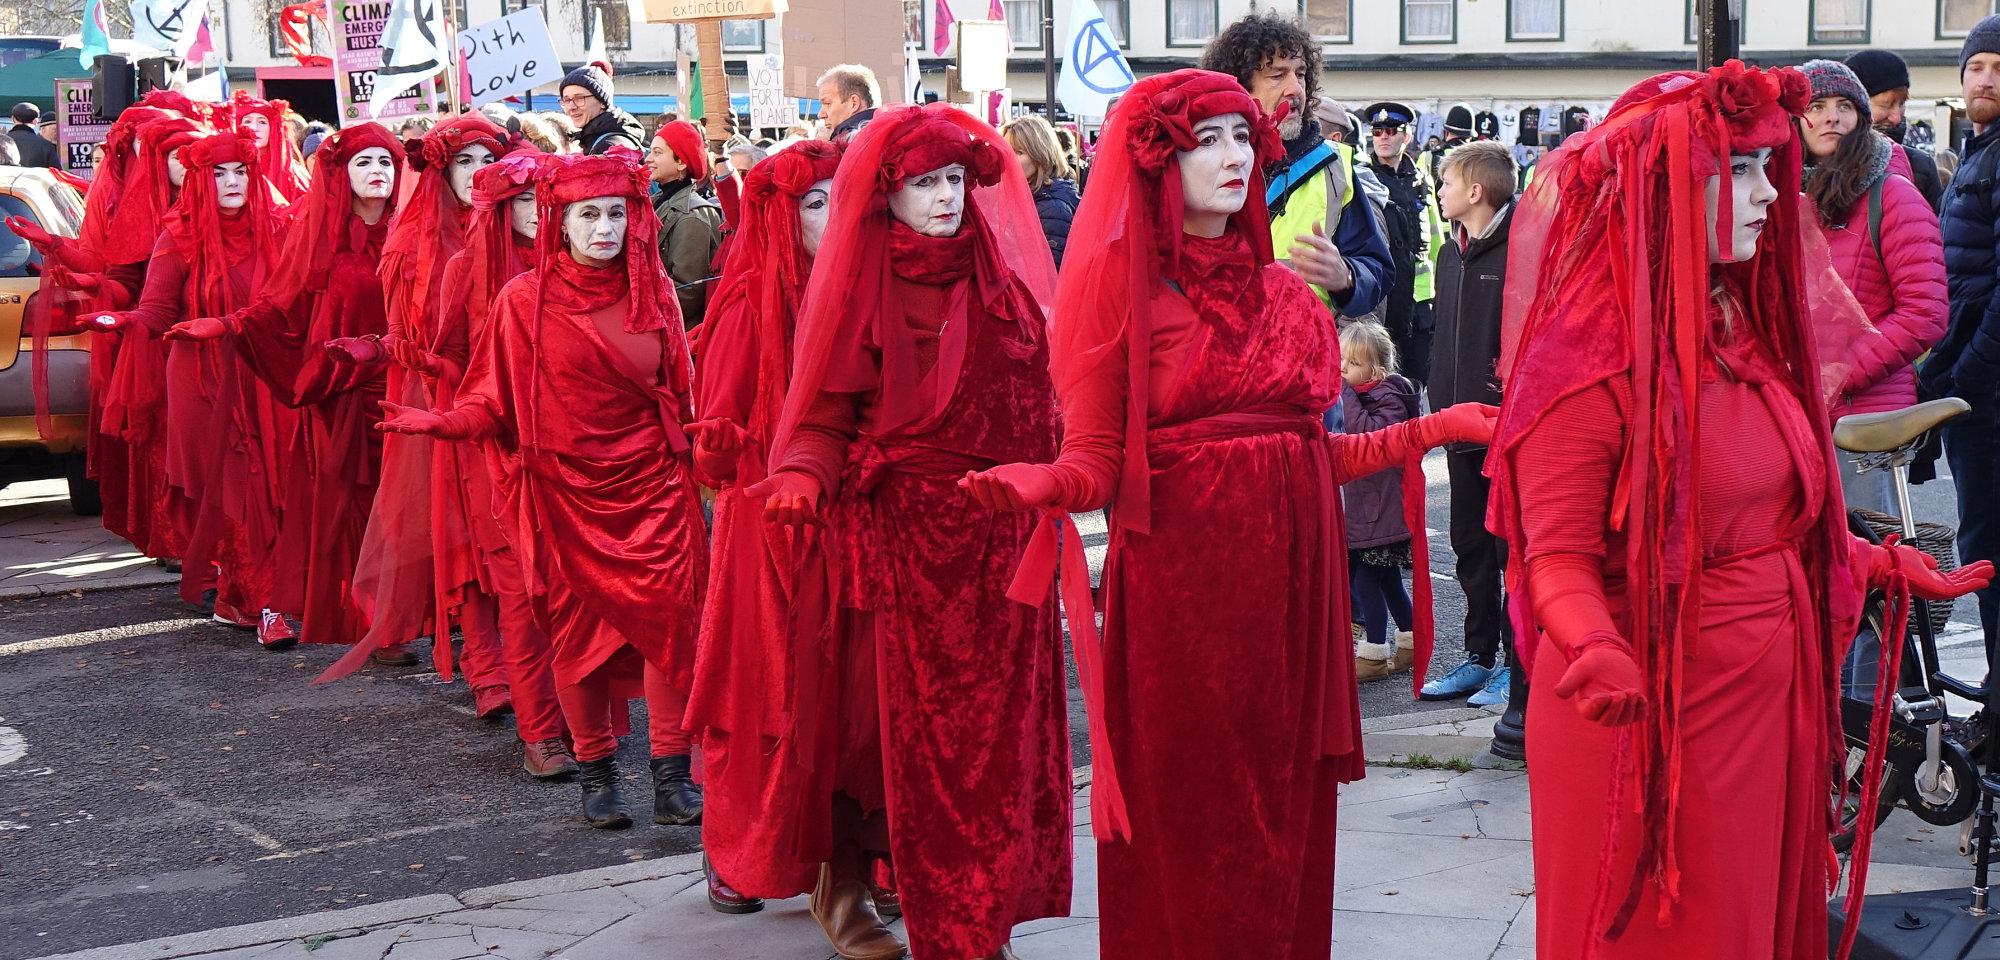 Part of Extinction Rebellion Demonstration in Bath, (end of November 2019)